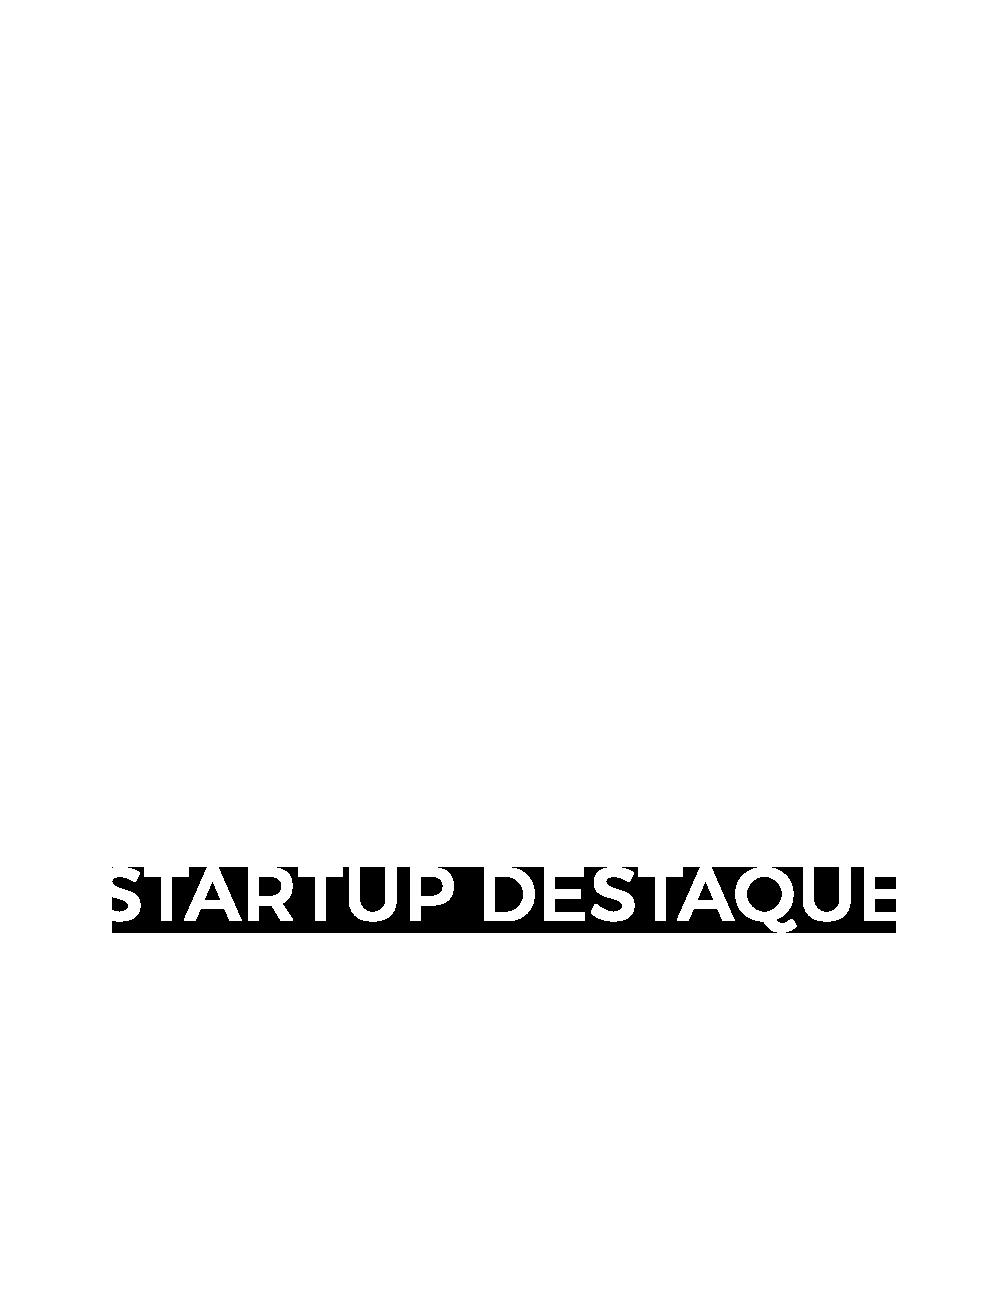 liga insights startup destaque liga ventures